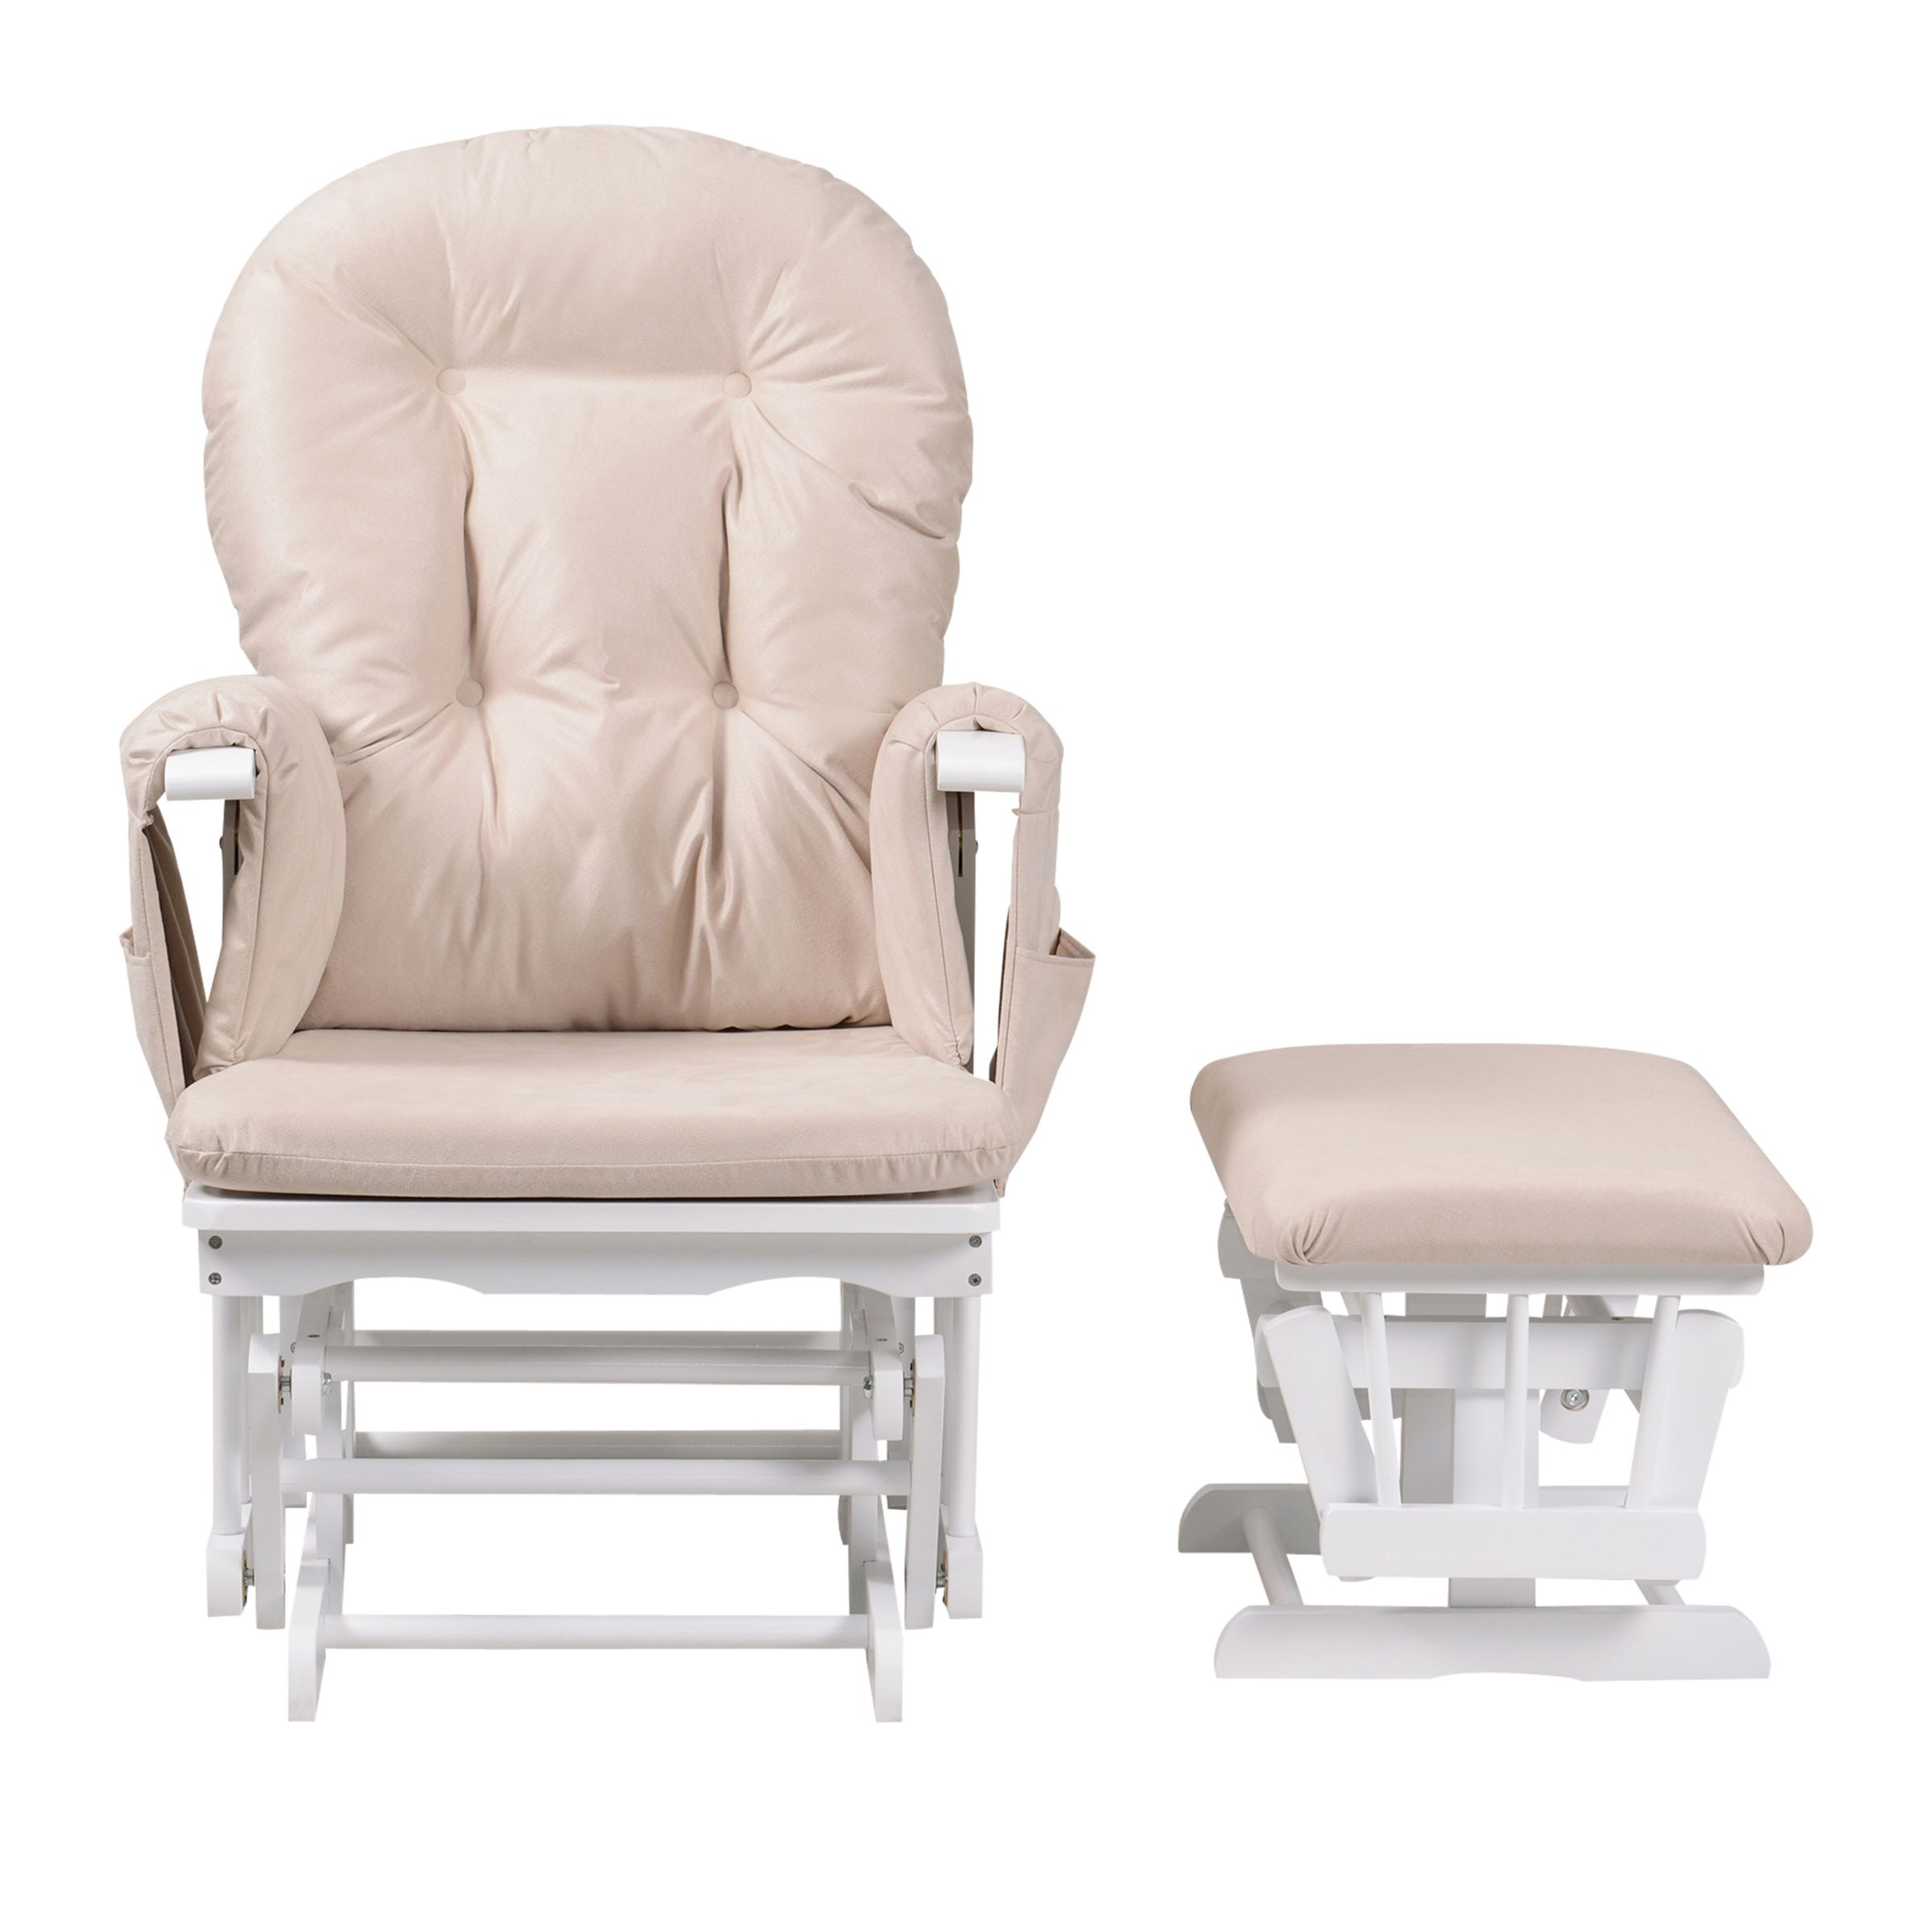 Kub Kub Haywood Reclining Glider Nursing Chair and Footstool, White